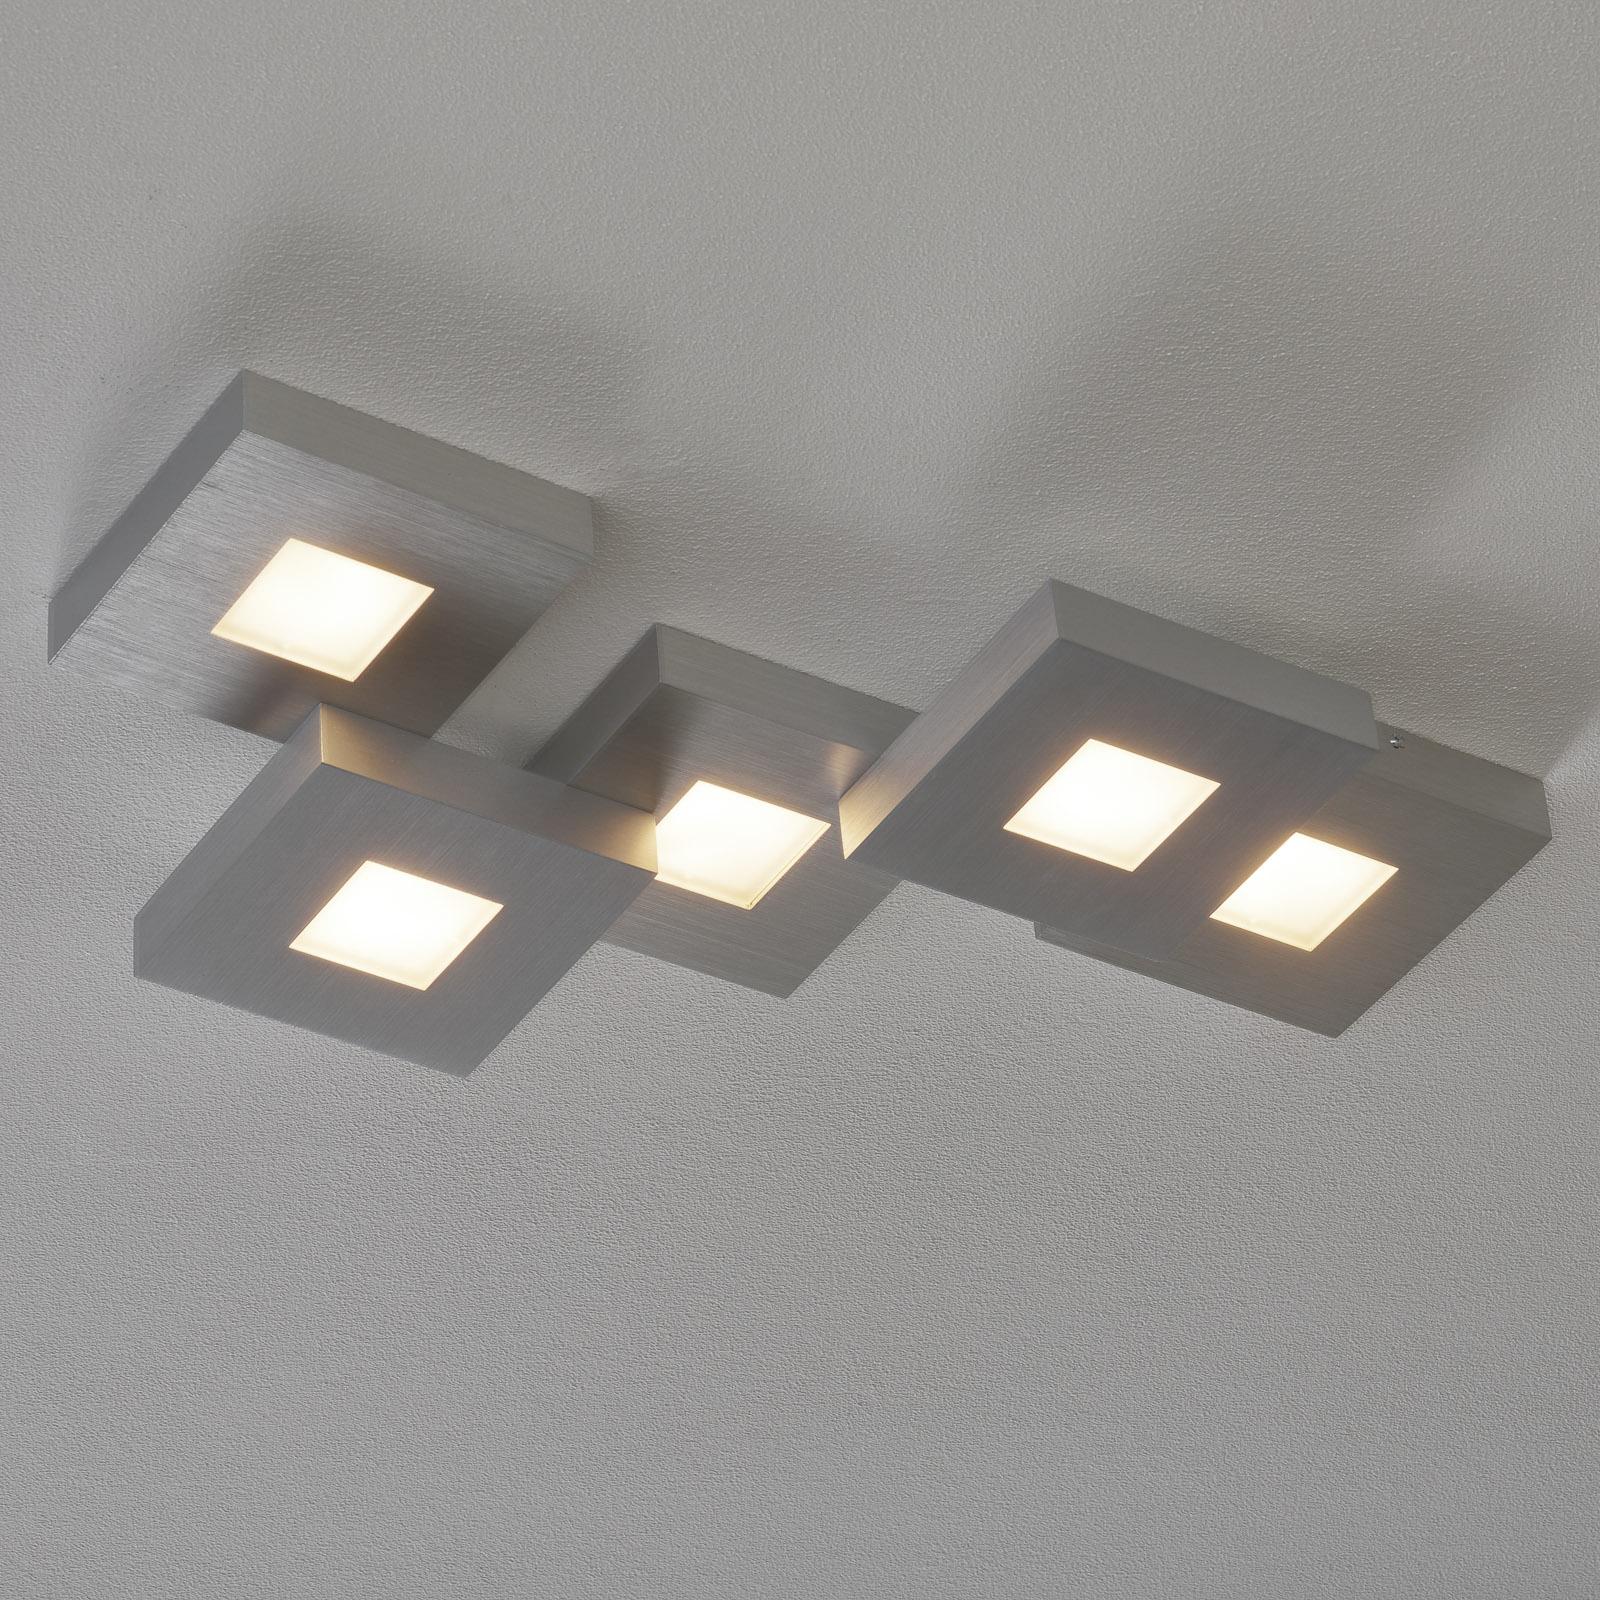 Plafonnier LED extravagant Cubus